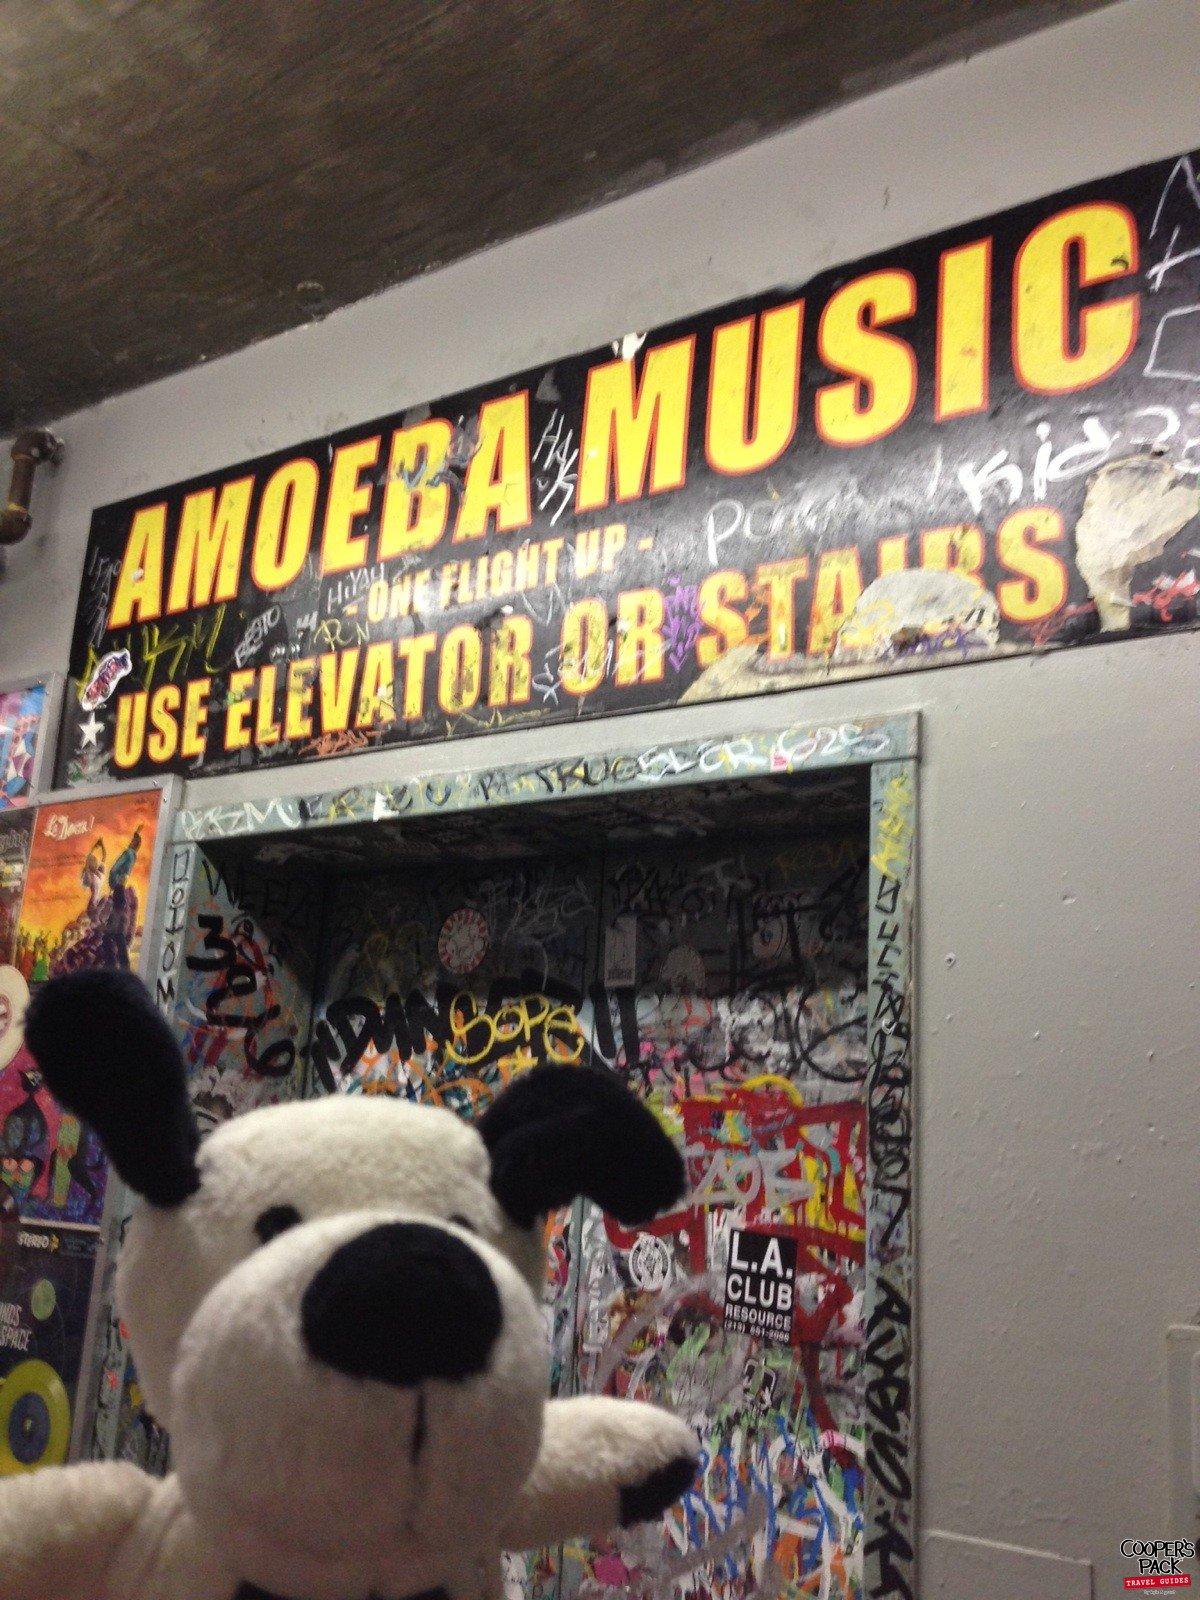 Cooper-Hollywood-Amoeba-Records3